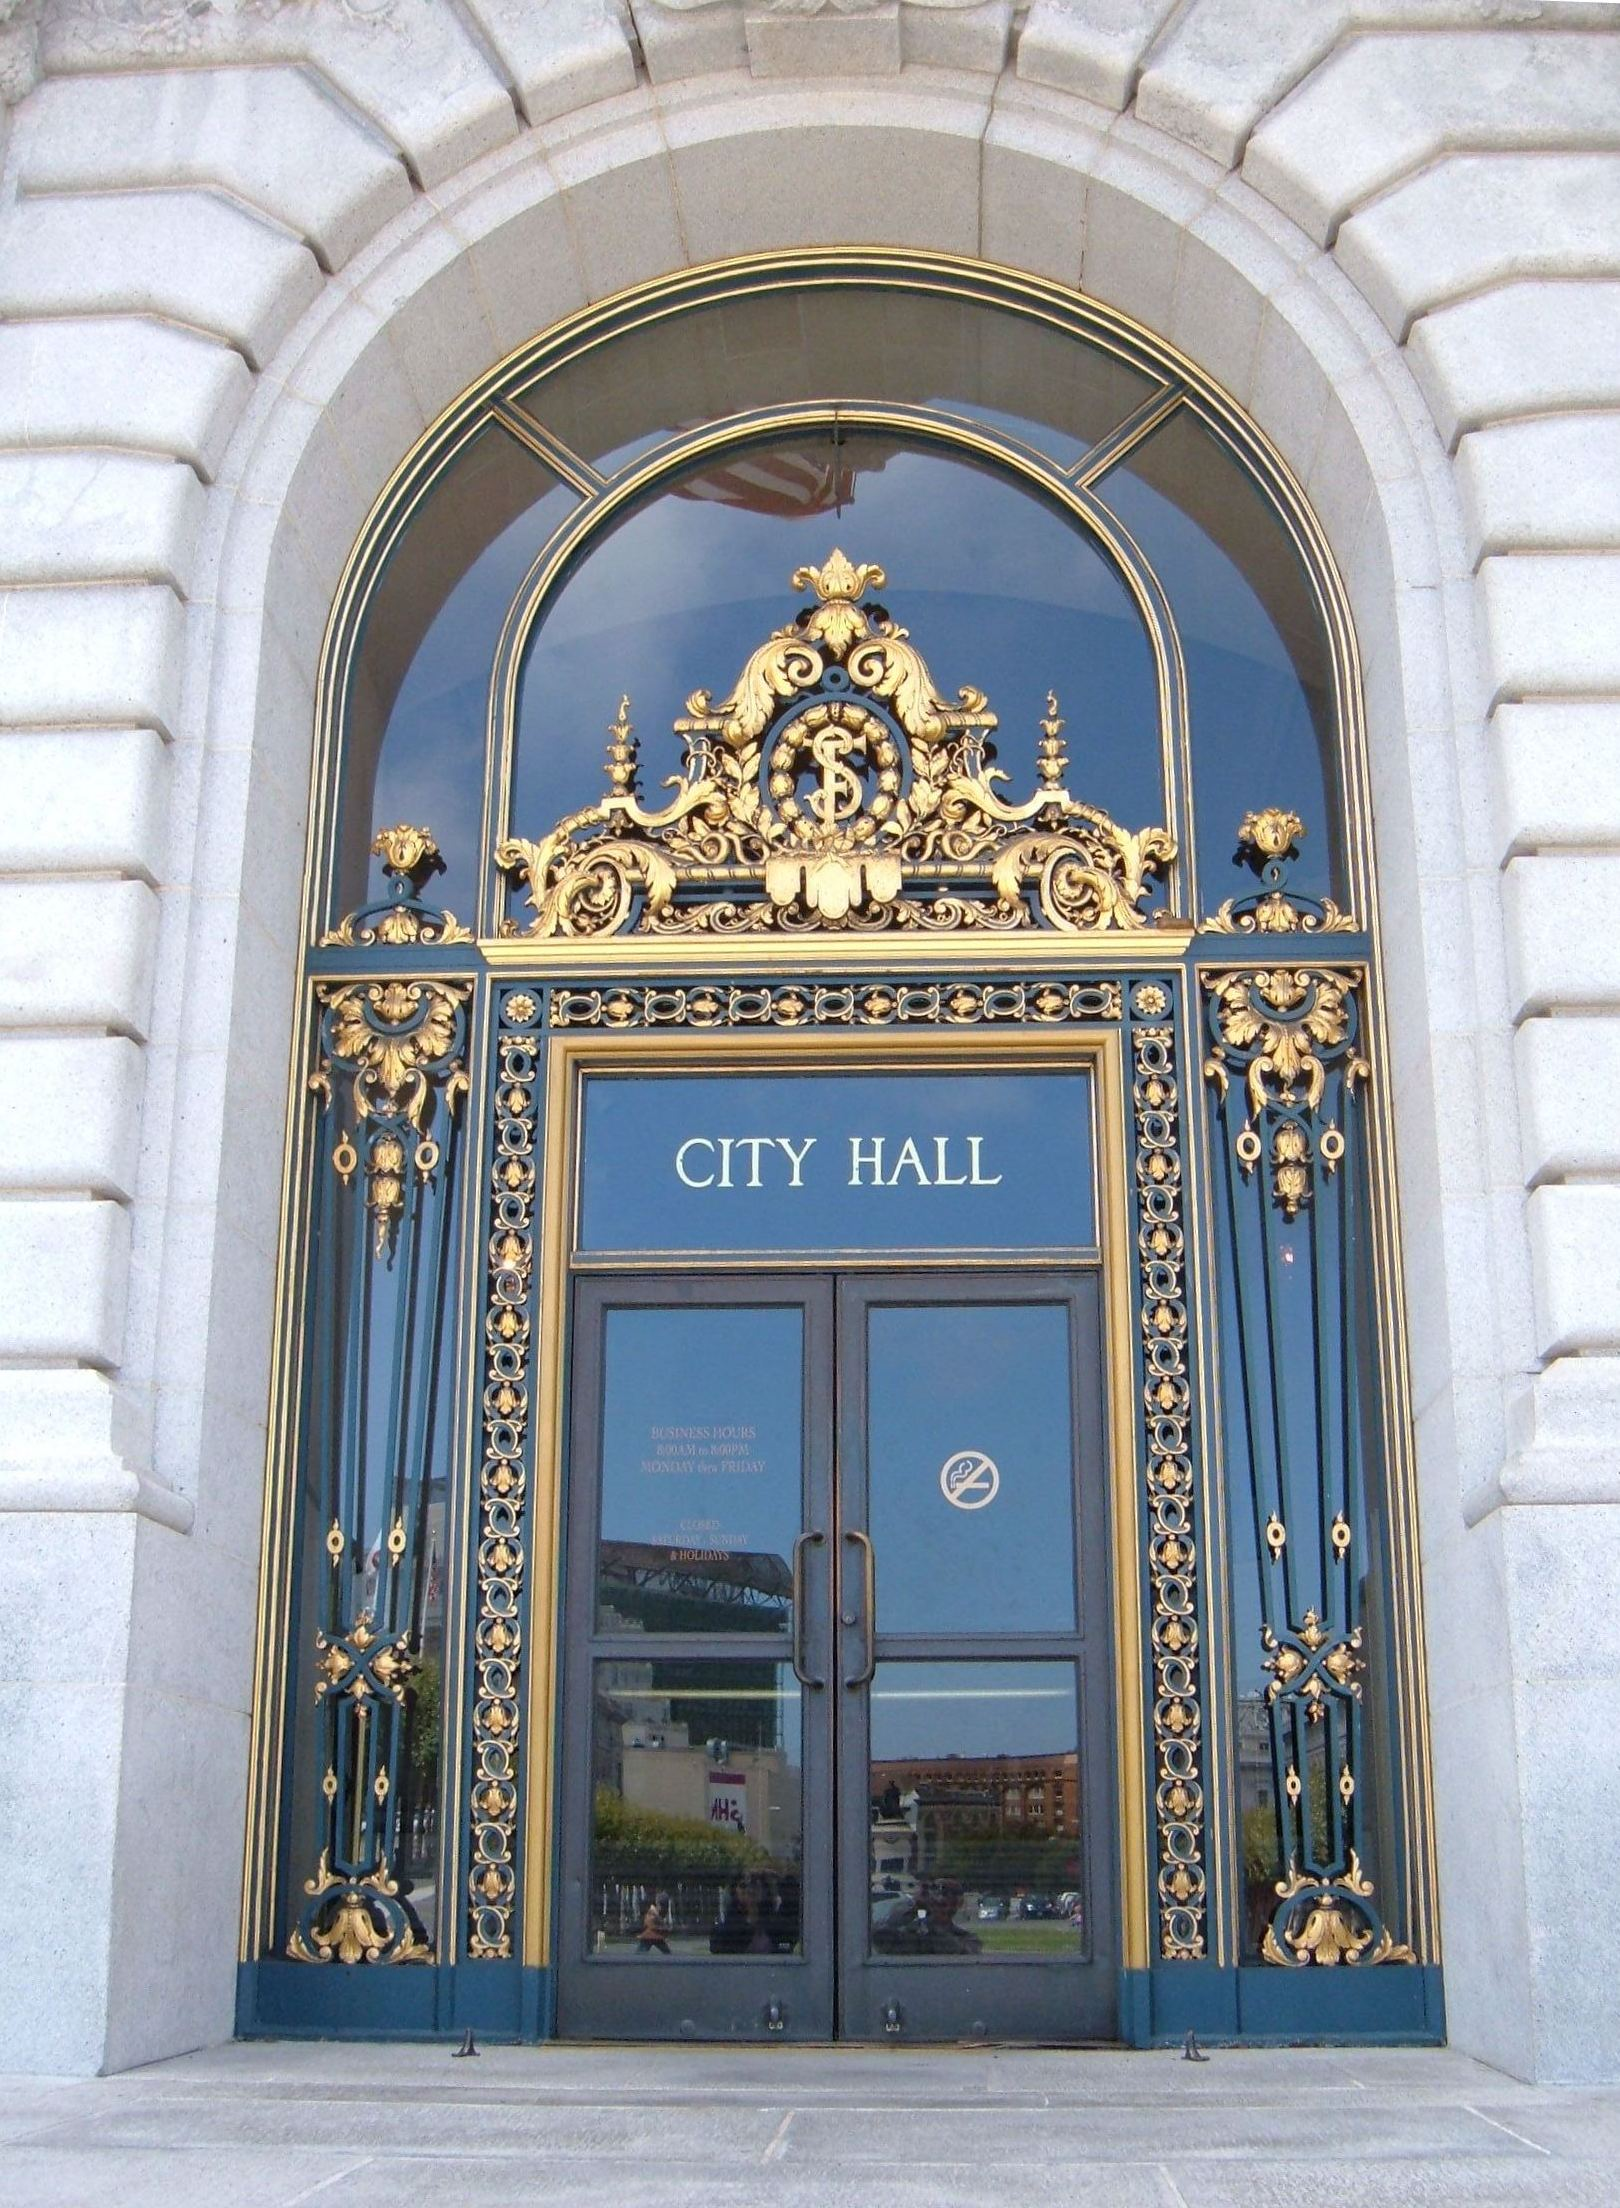 FileSF City Hall door.JPG & File:SF City Hall door.JPG - Wikimedia Commons